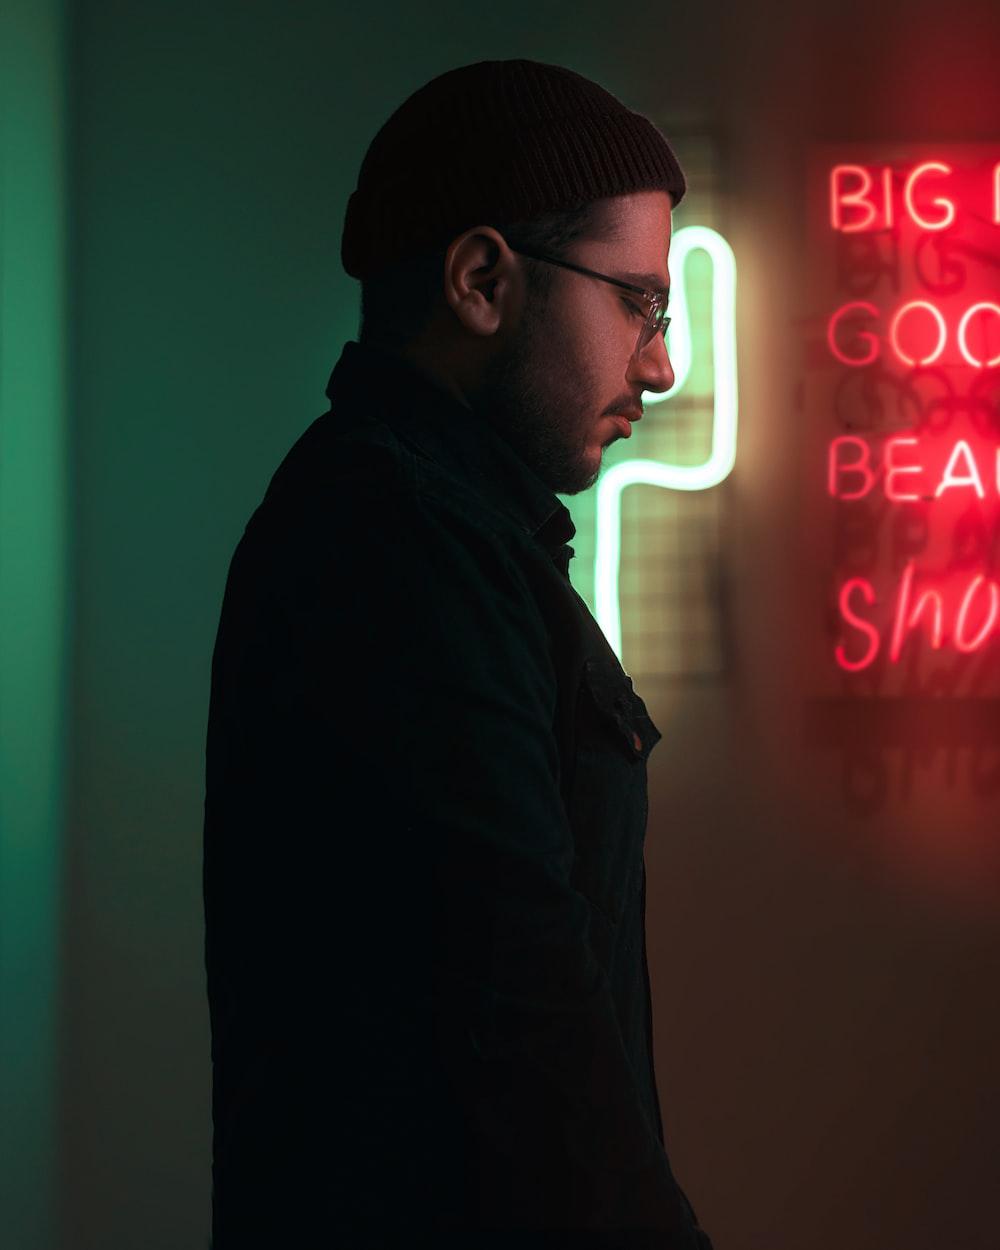 man in black jacket standing near neon sign